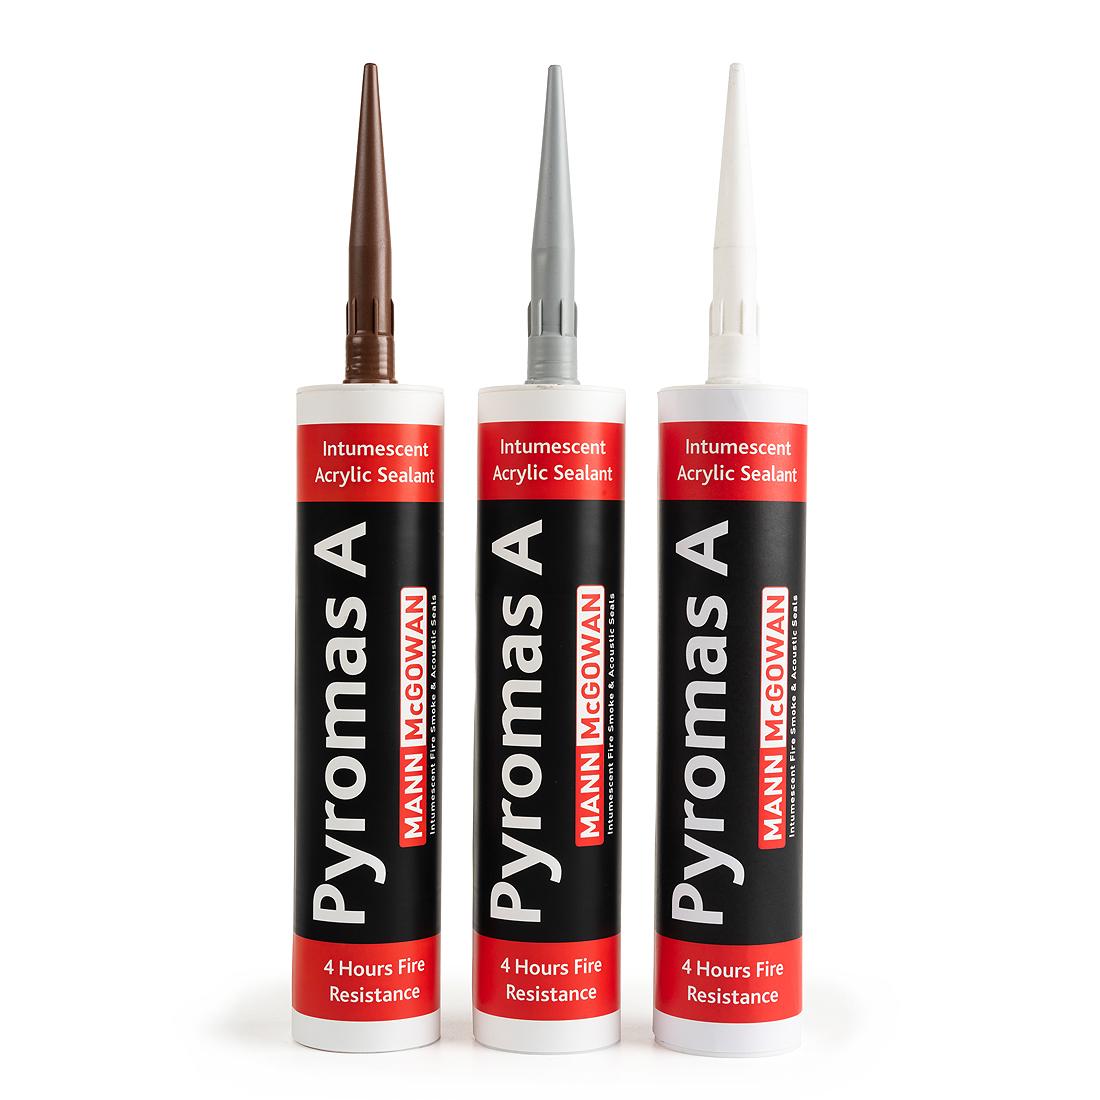 Pyromas A - Intumescent Acrylic Sealant